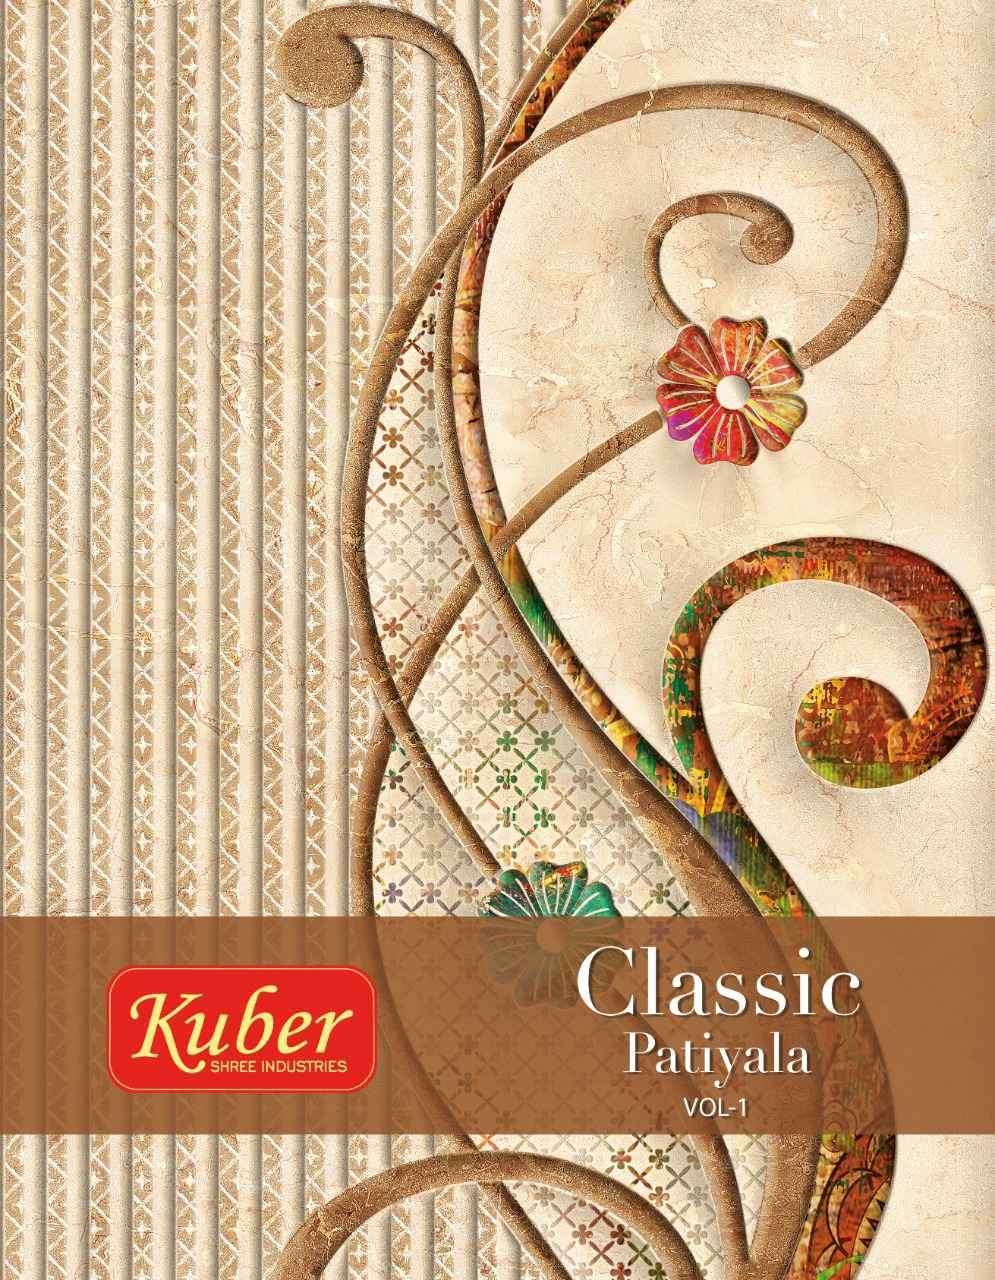 Kuber Classic Patiyala Vol 1 Cotton Suit Wholesale price